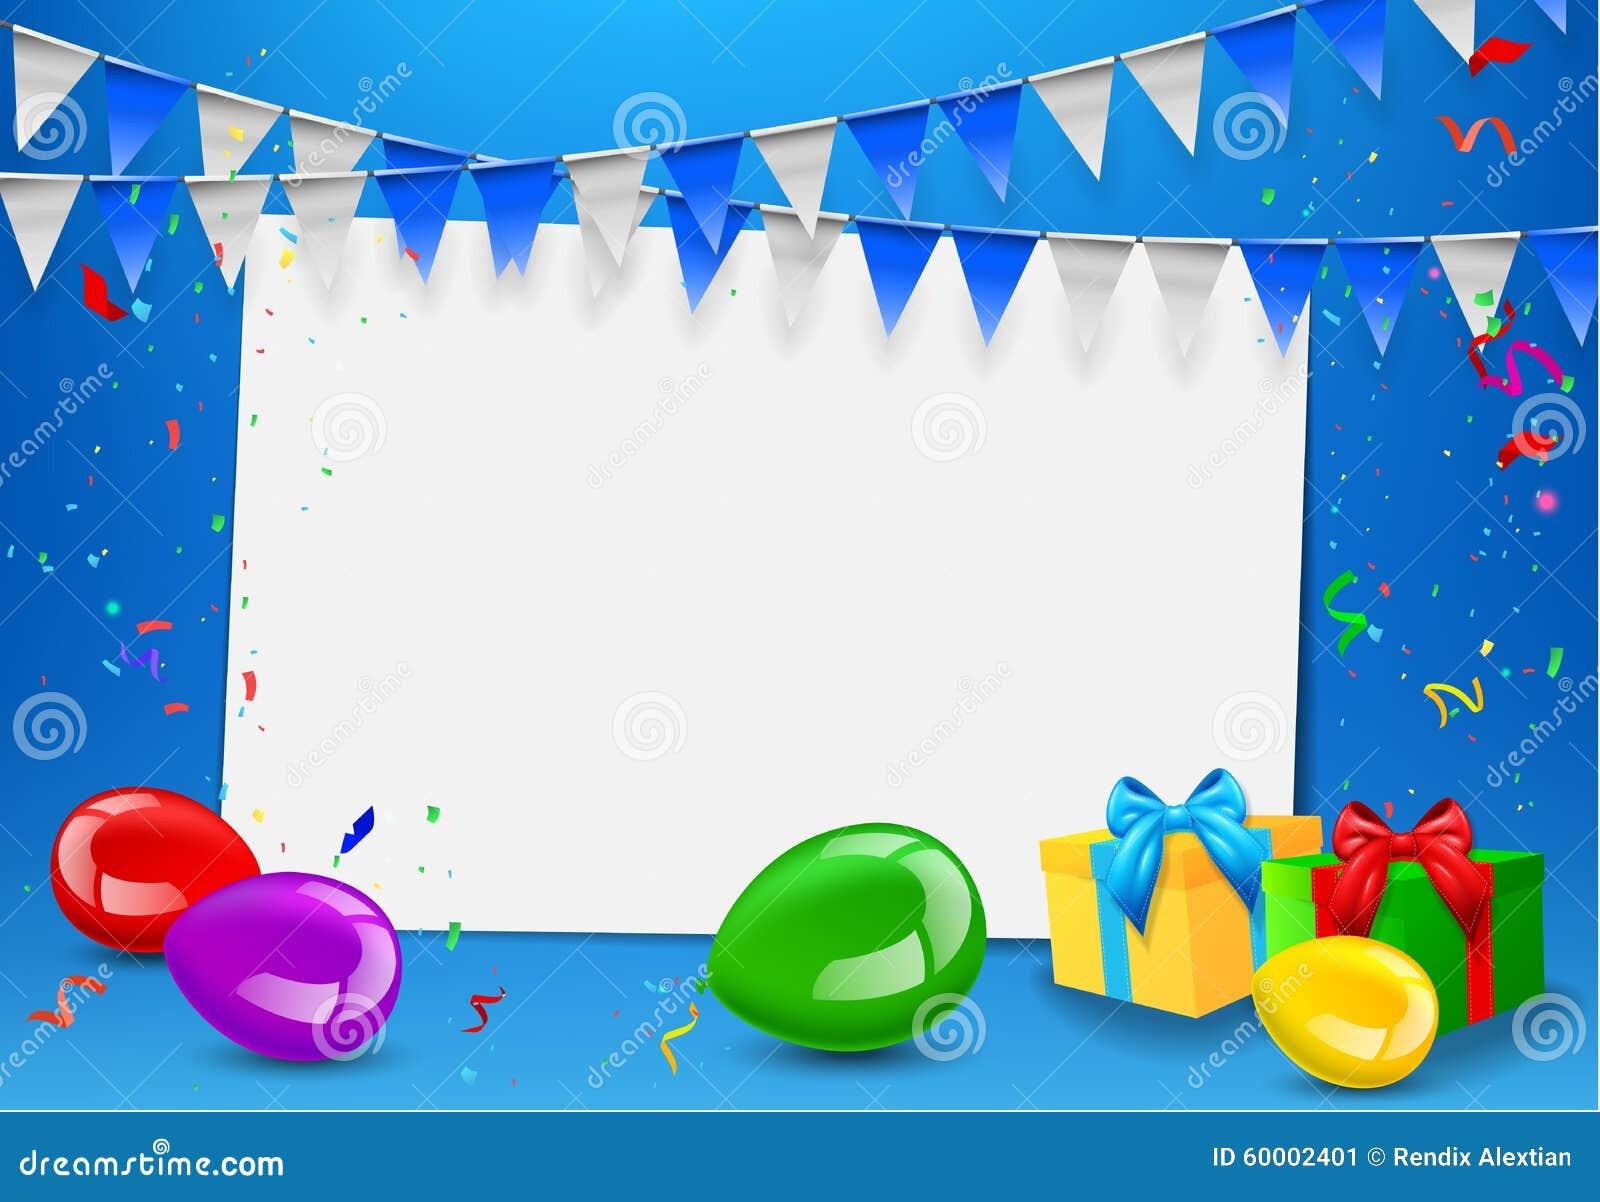 Happy Birthday Greeting Card Stock Illustration Illustration Of Balloons Celebration 60002401